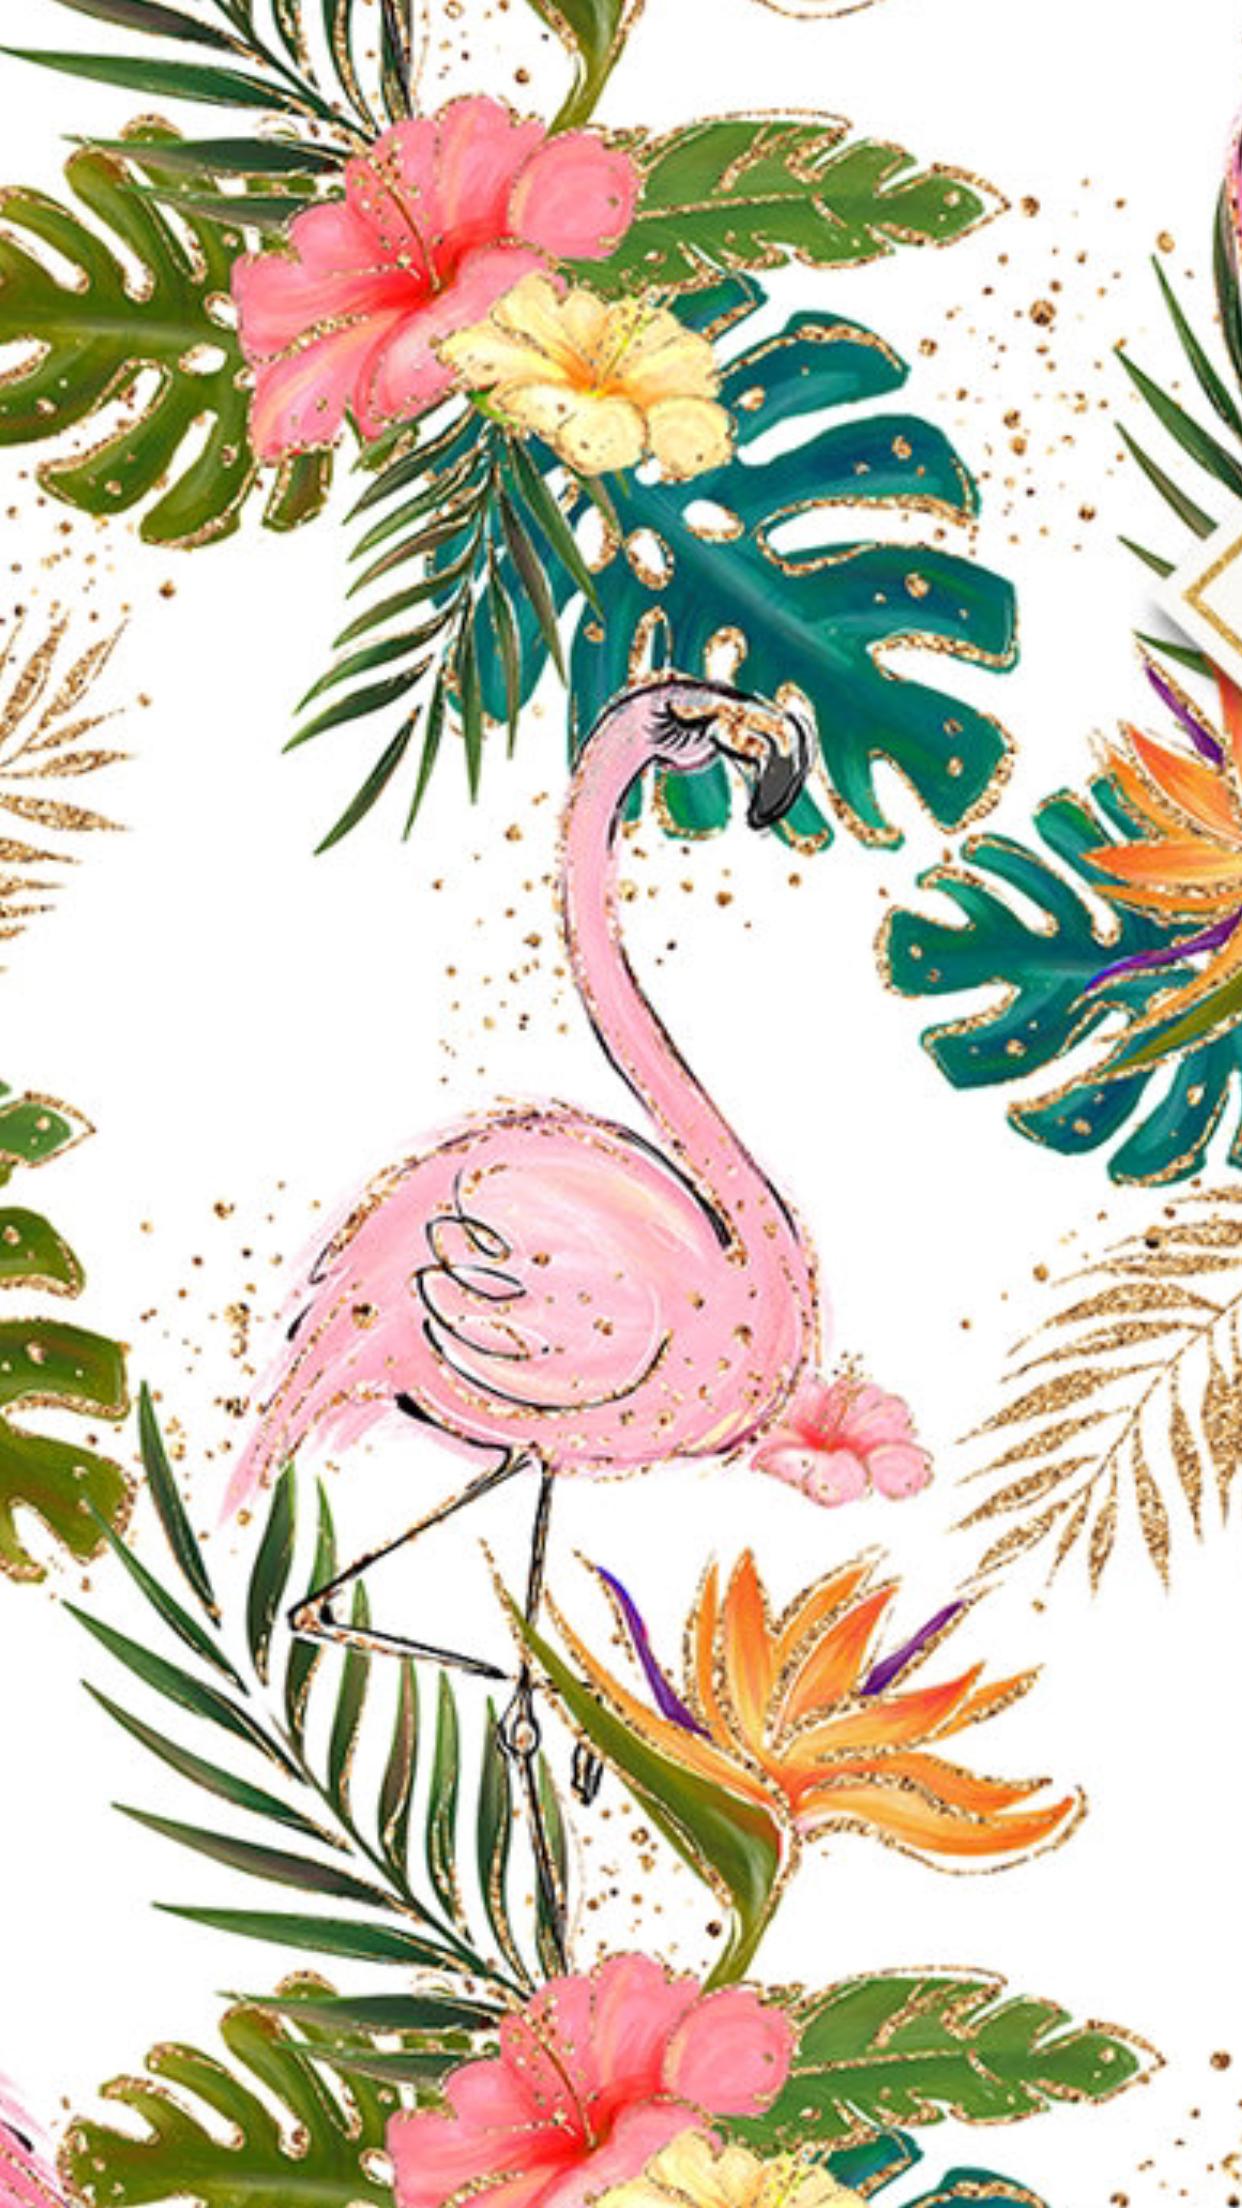 Pin By Wessam Hu On Fondo Flamingo Wallpaper Pink Flamingo Wallpaper Wallpaper Backgrounds